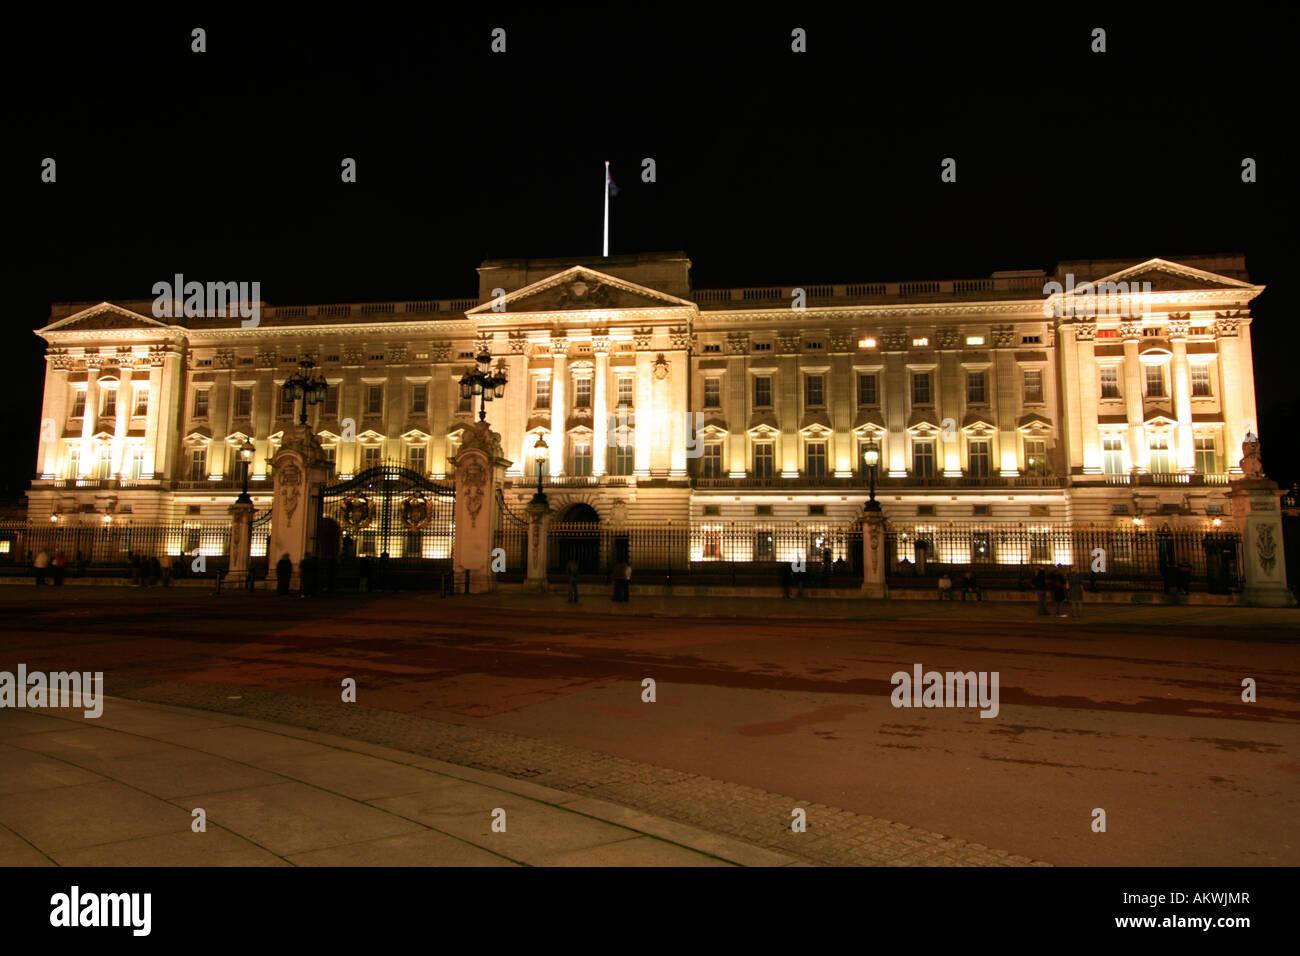 night-time-with-new-lighting-scheme-on-buckingham-palace-london-england-AKWJMR.jpg